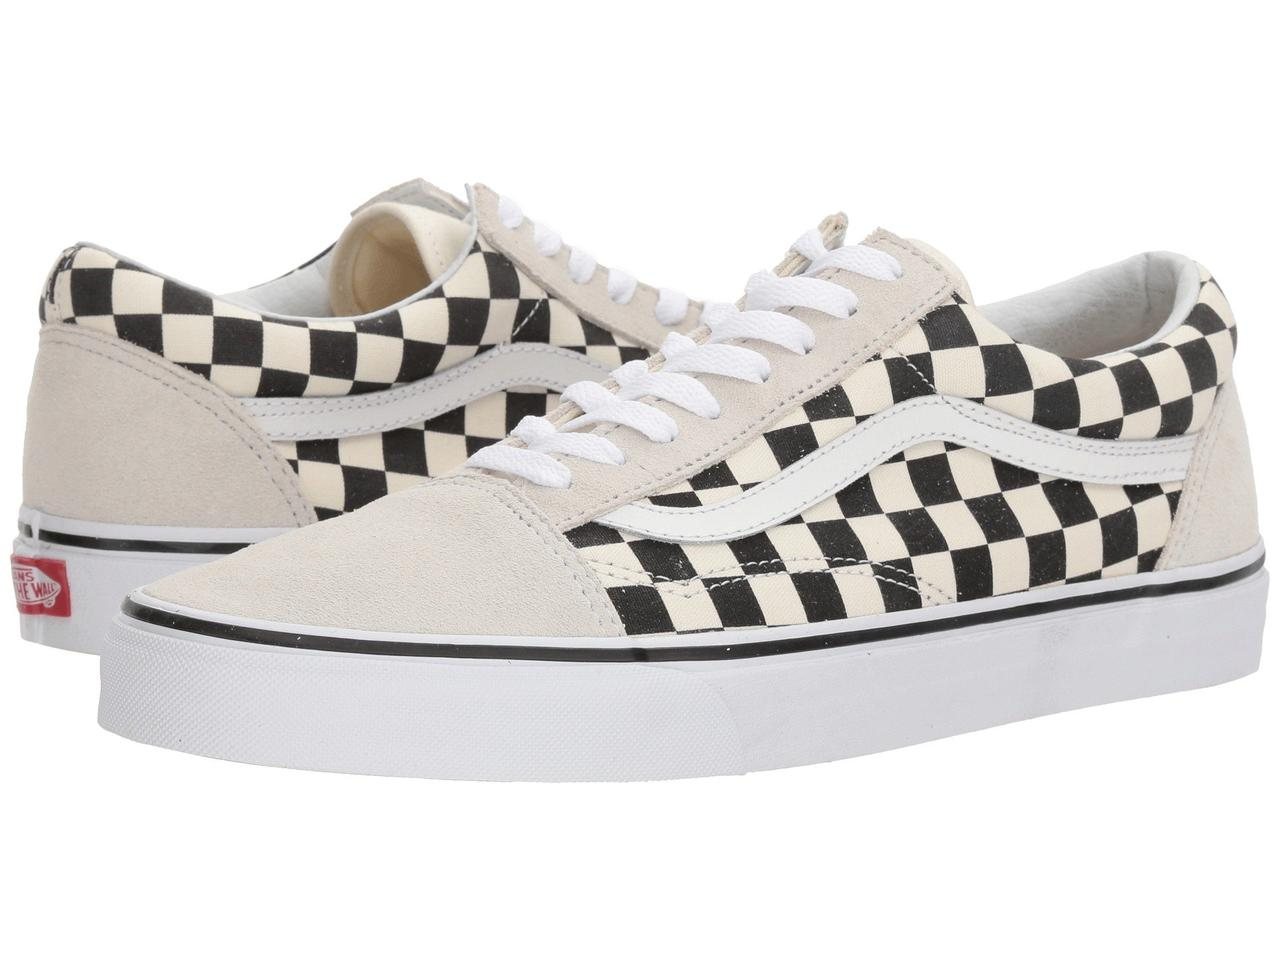 Кроссовки Кеды (Оригинал) Vans Old Skool™ (Checkerboard) White Black ... c64e72f3065